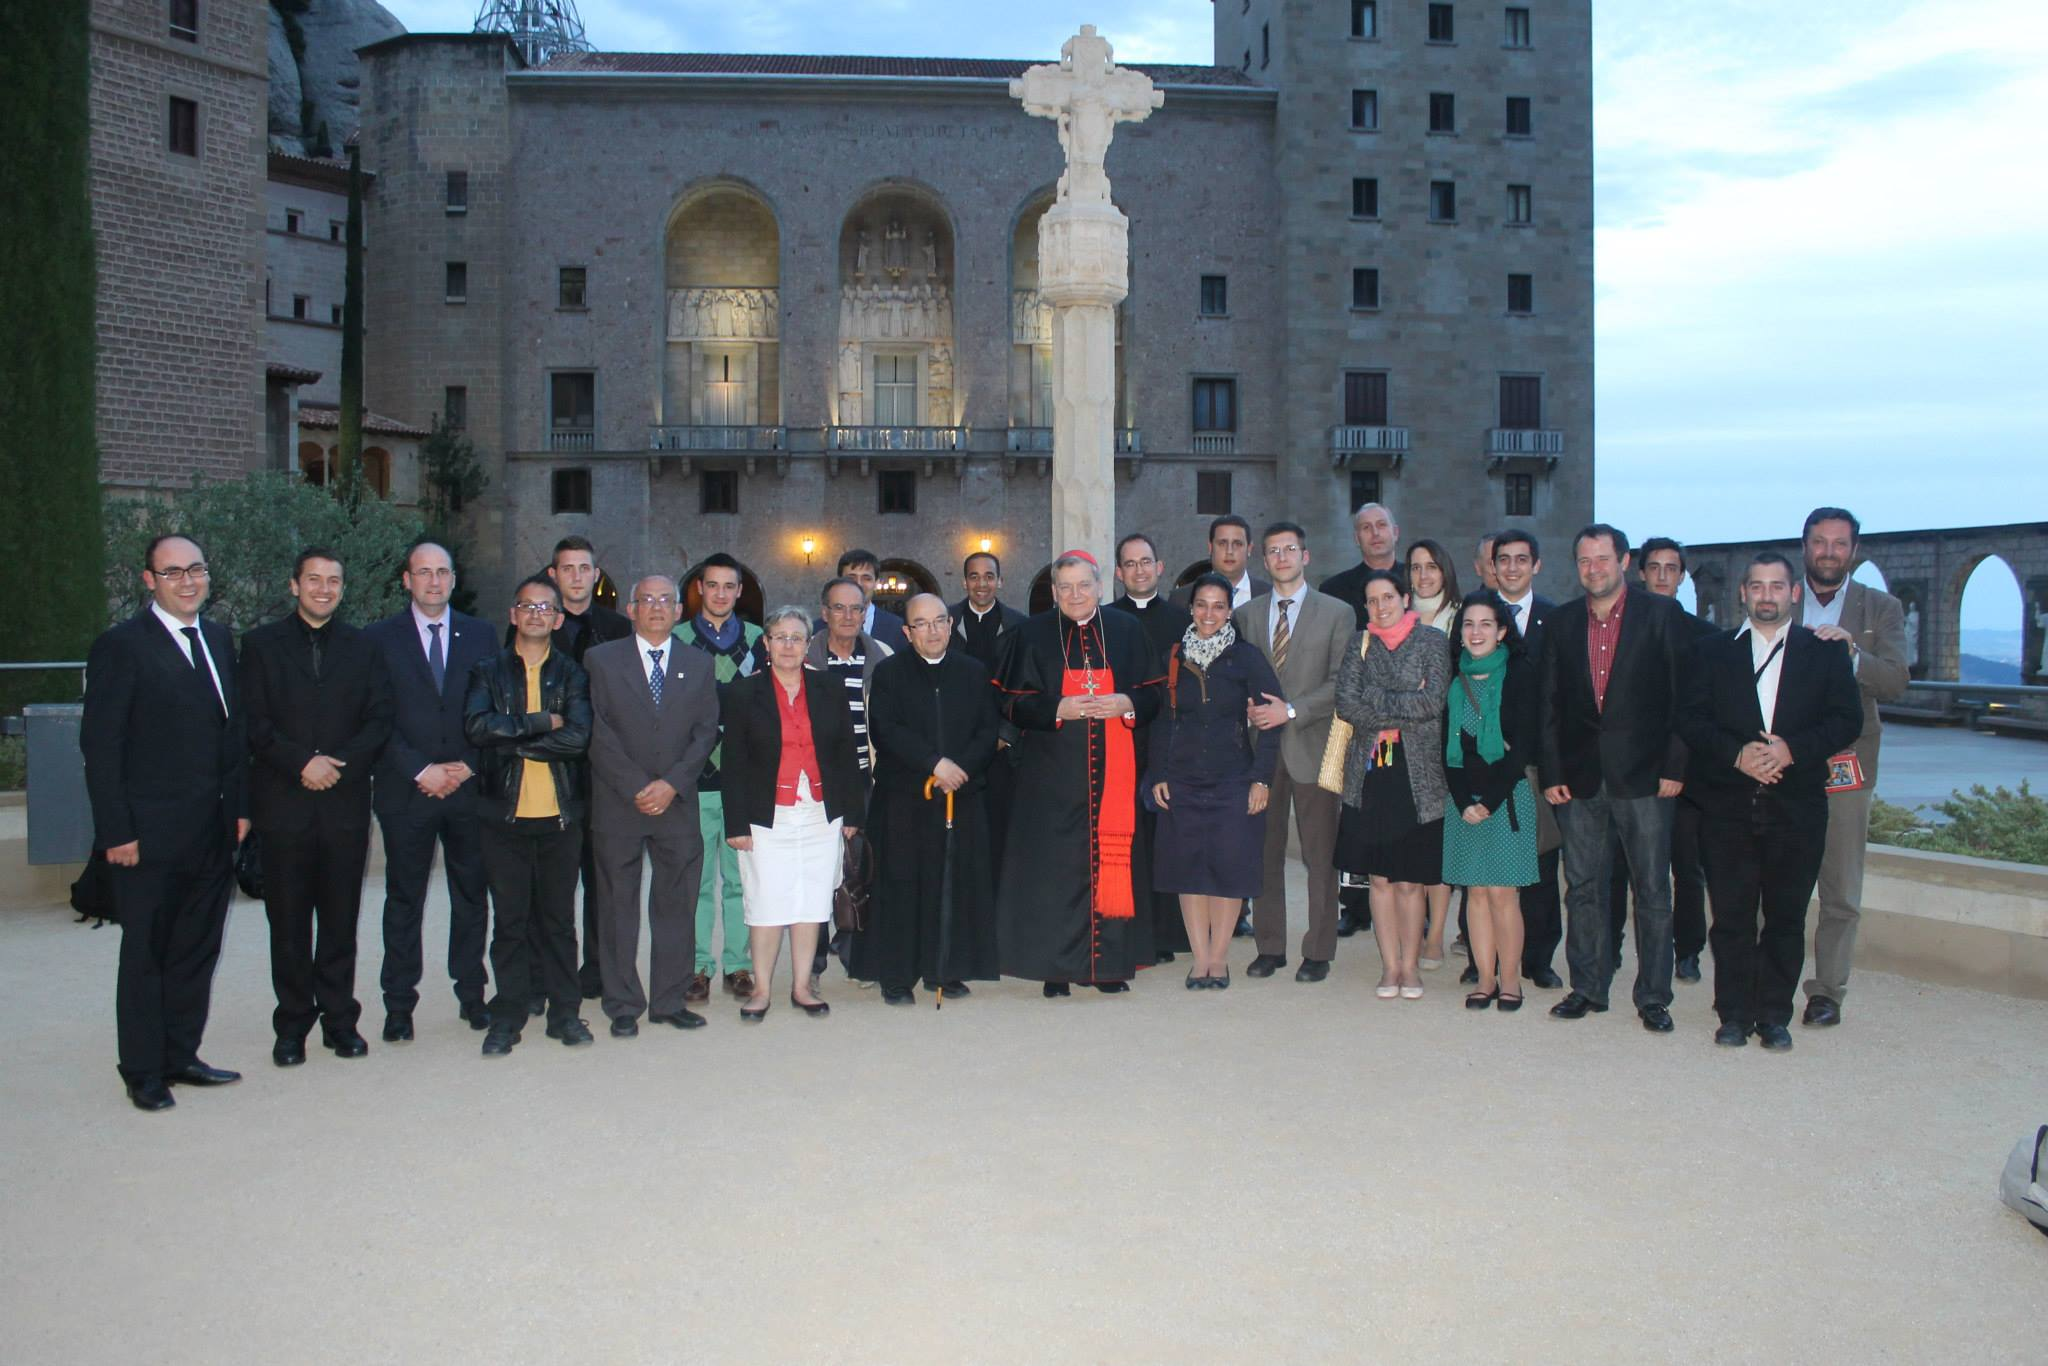 Hace un a o de la visita del cardenal burke a barcelona - Barcelona san jose ...